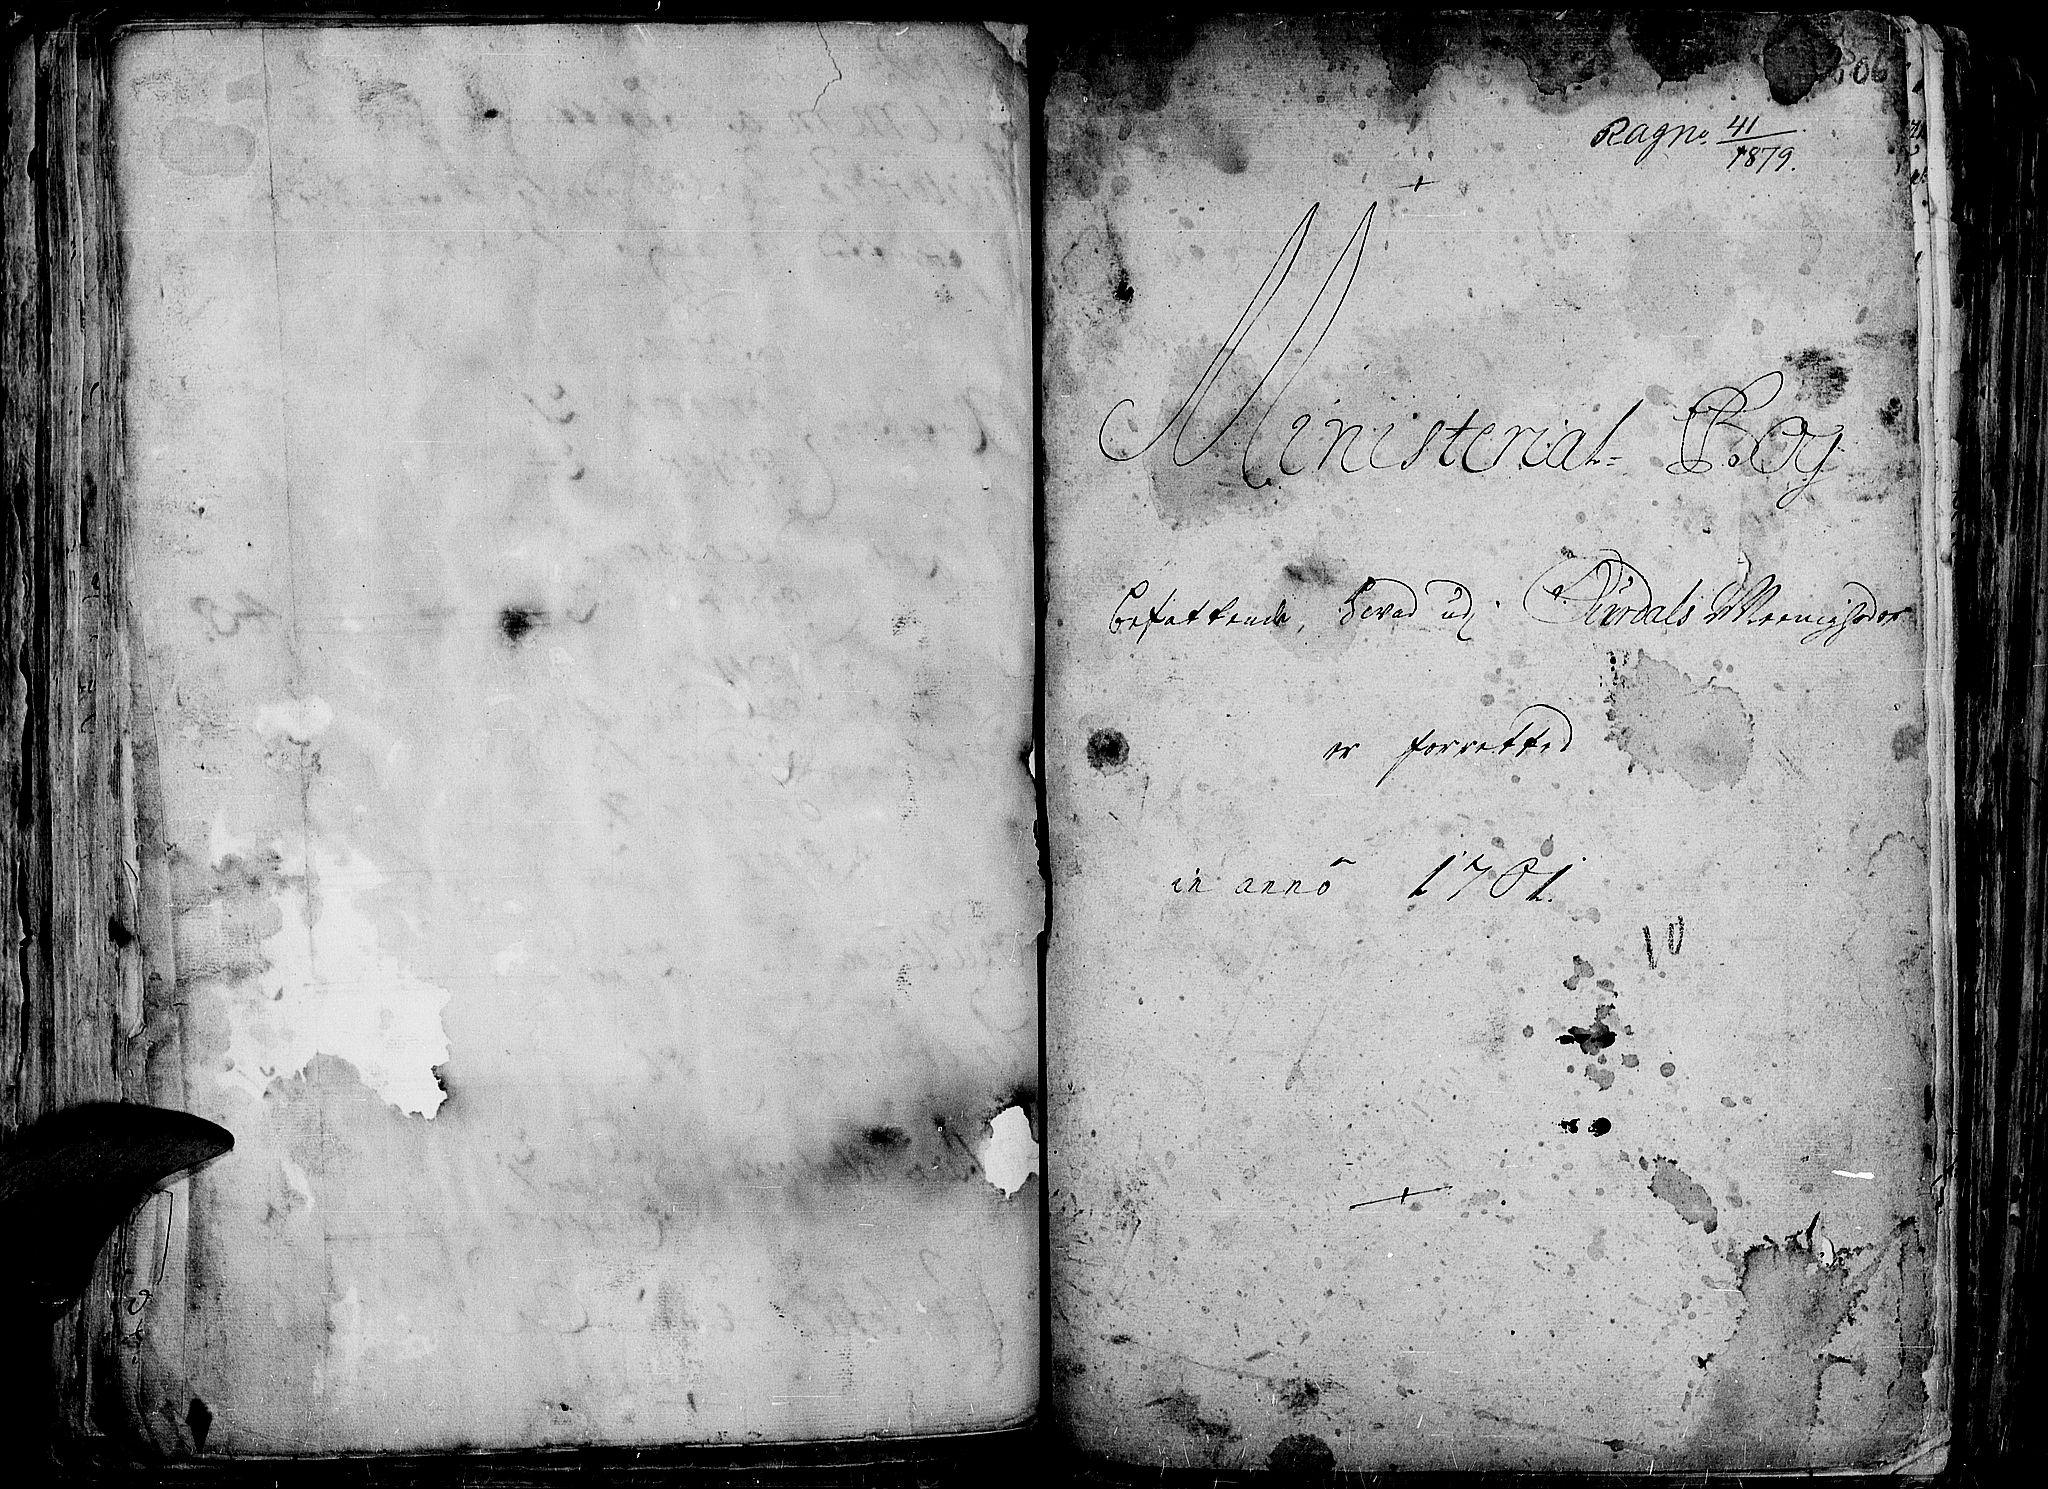 SAH, Aurdal prestekontor, Ministerialbok nr. 1-3, 1692-1730, s. 206